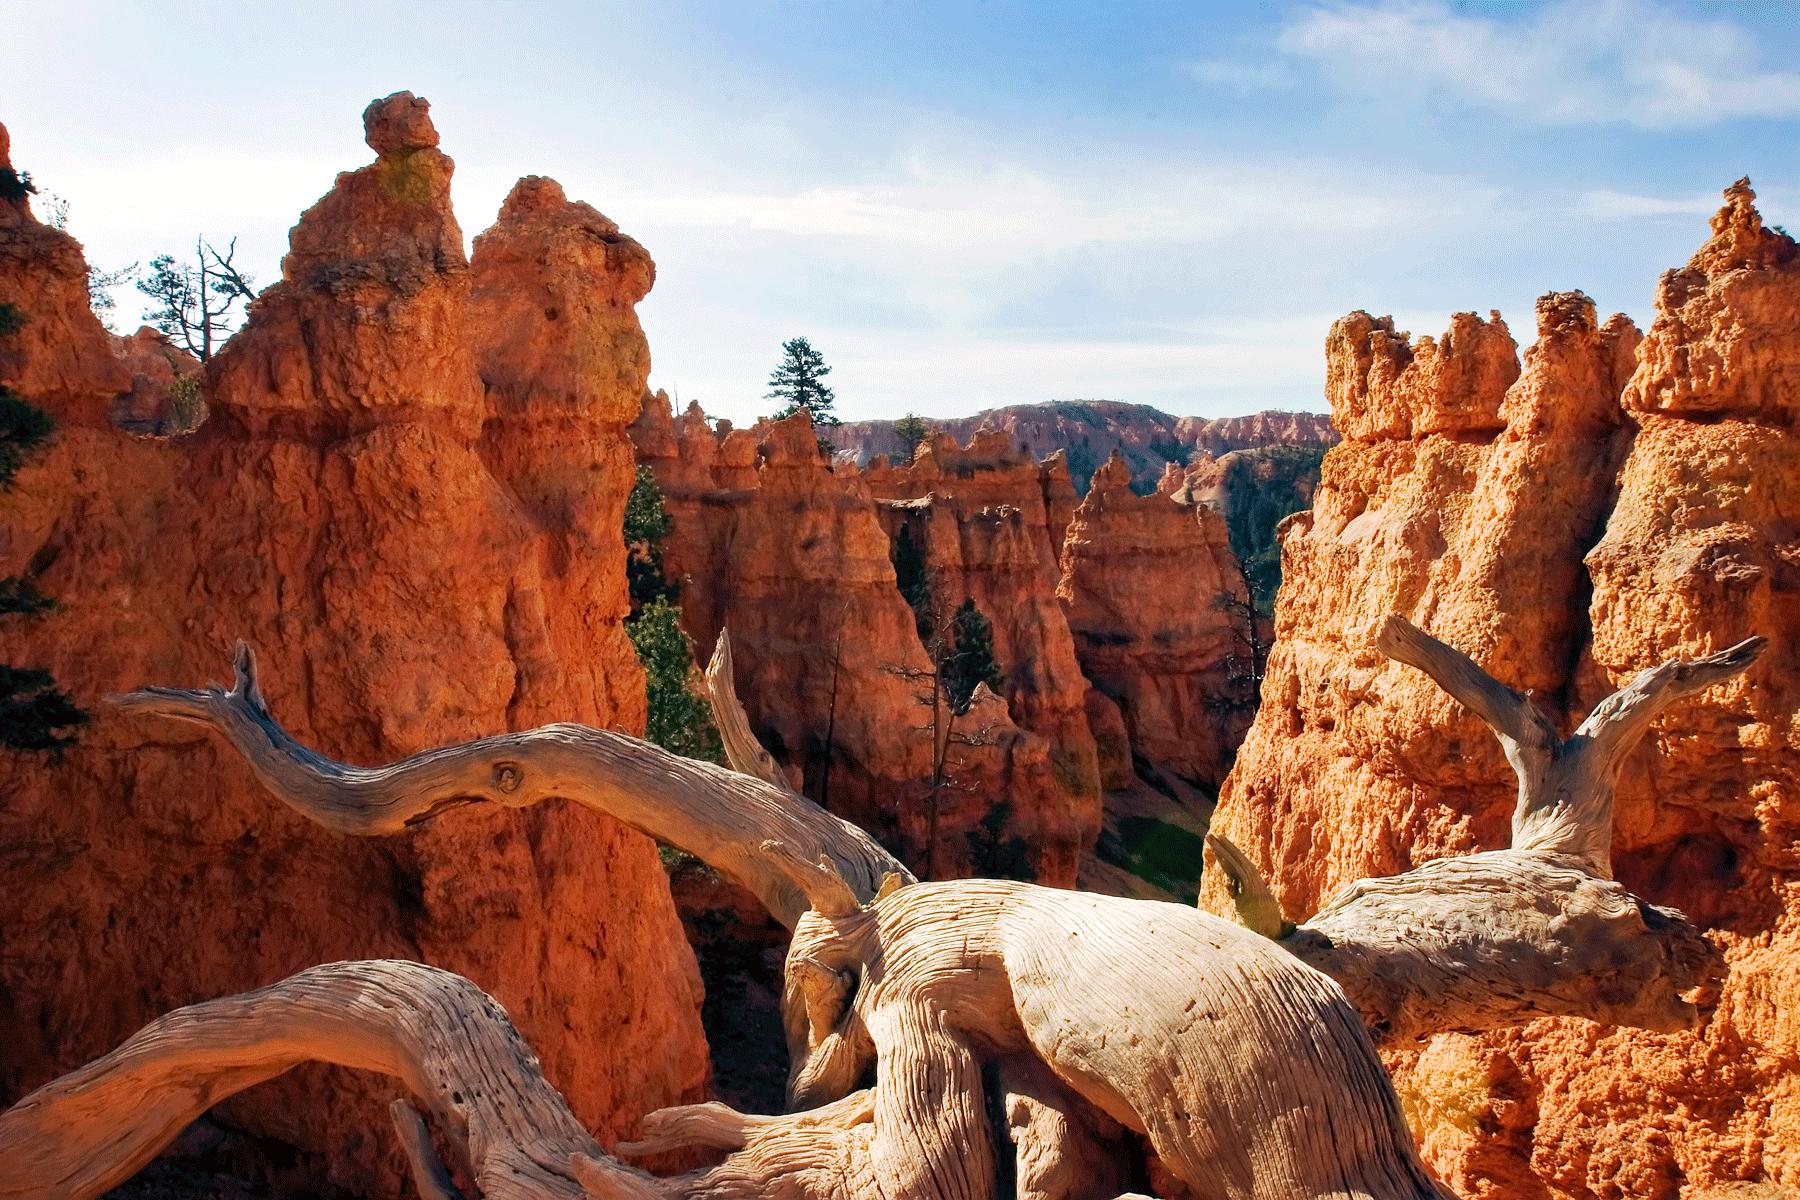 bryce-canyon-national-park-utah-trail-scene